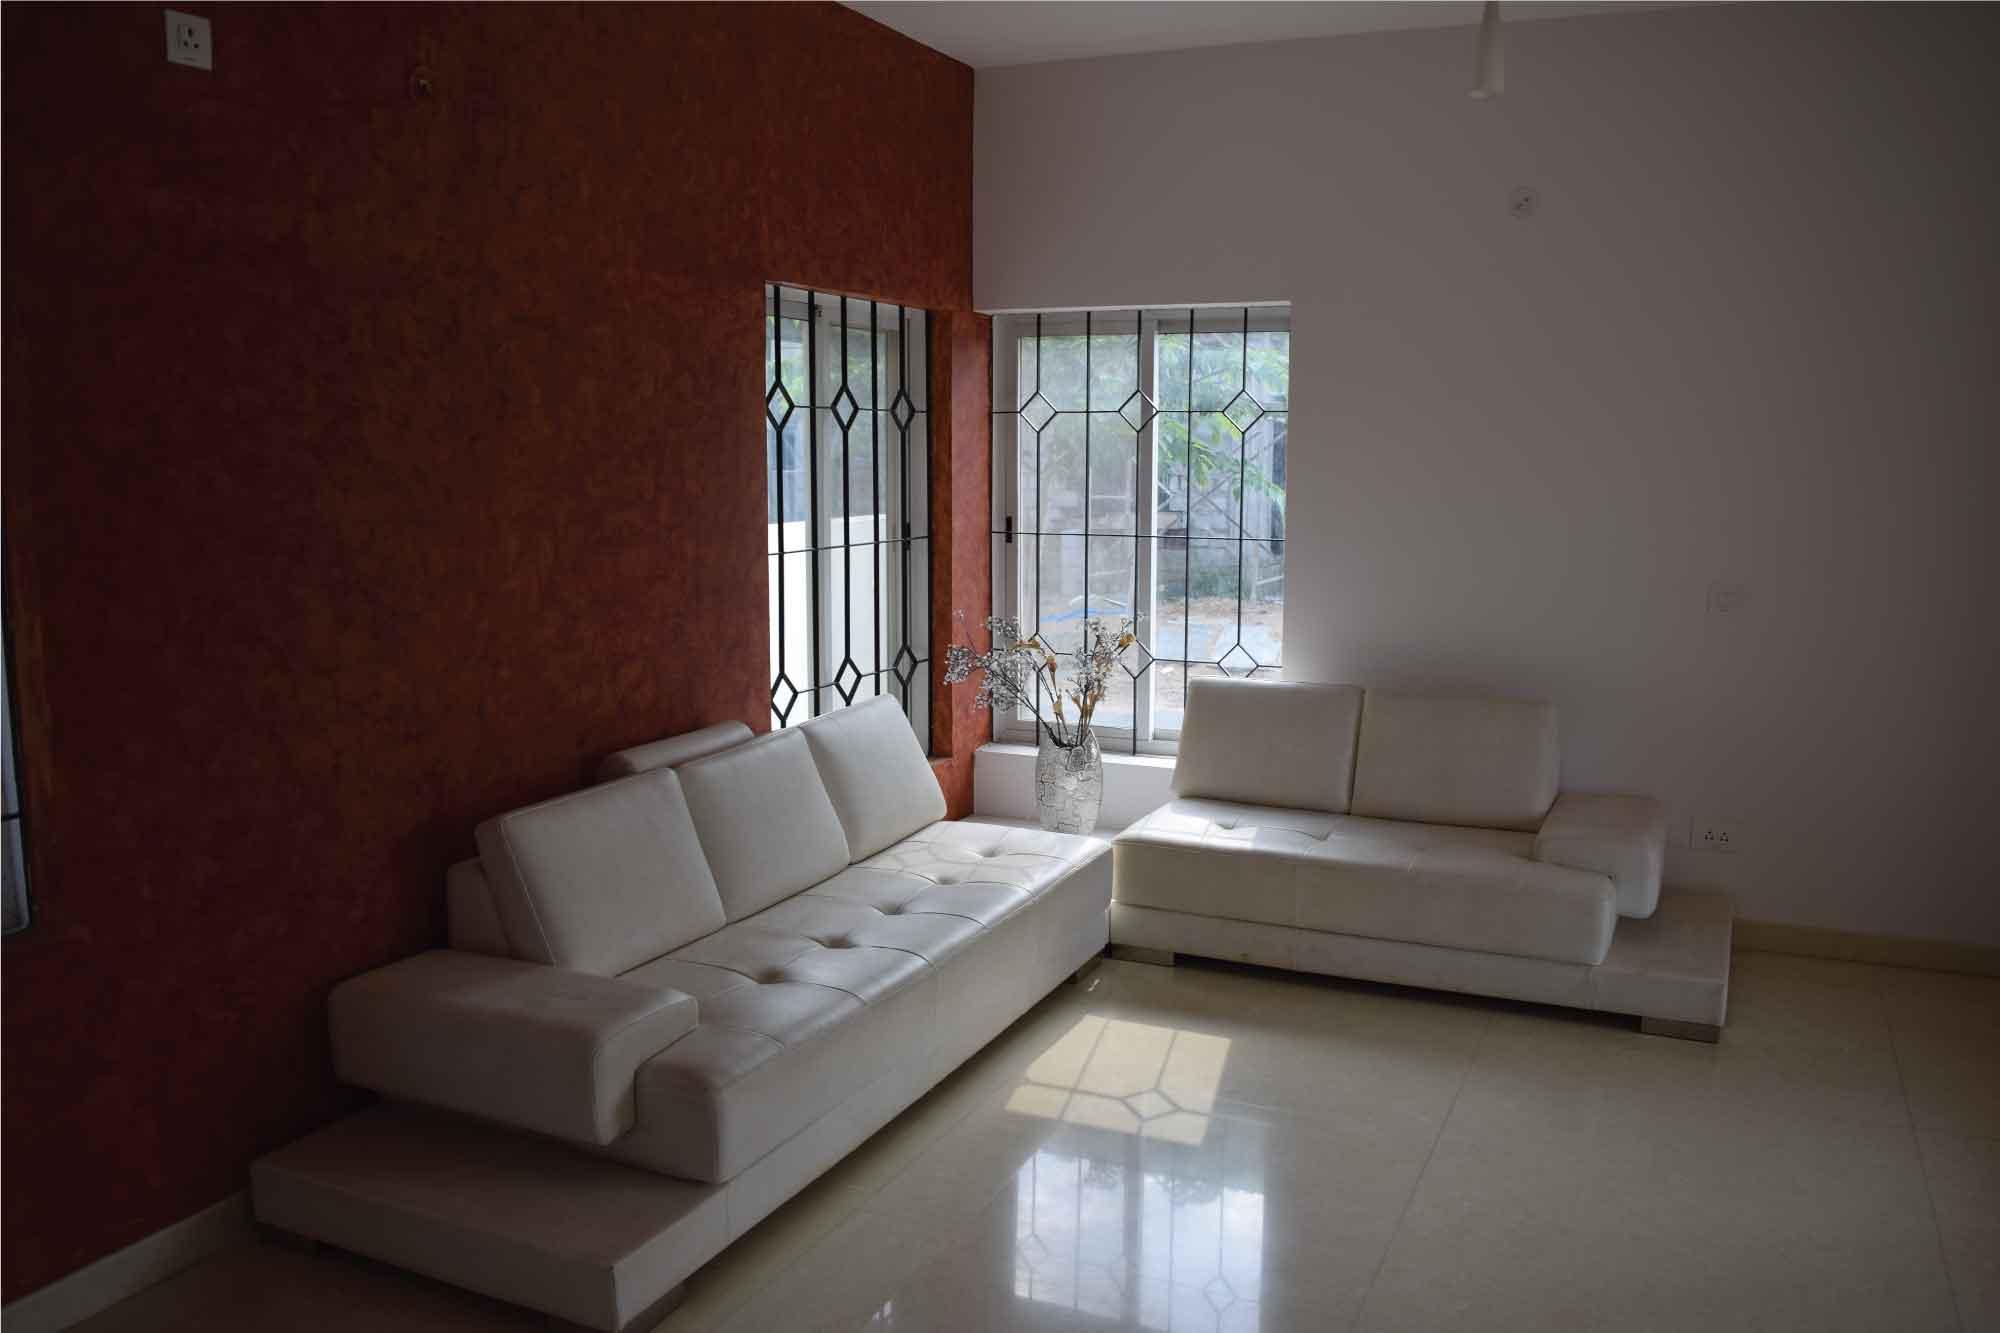 Artha Reviera Villa Marsur Bangalore 10846